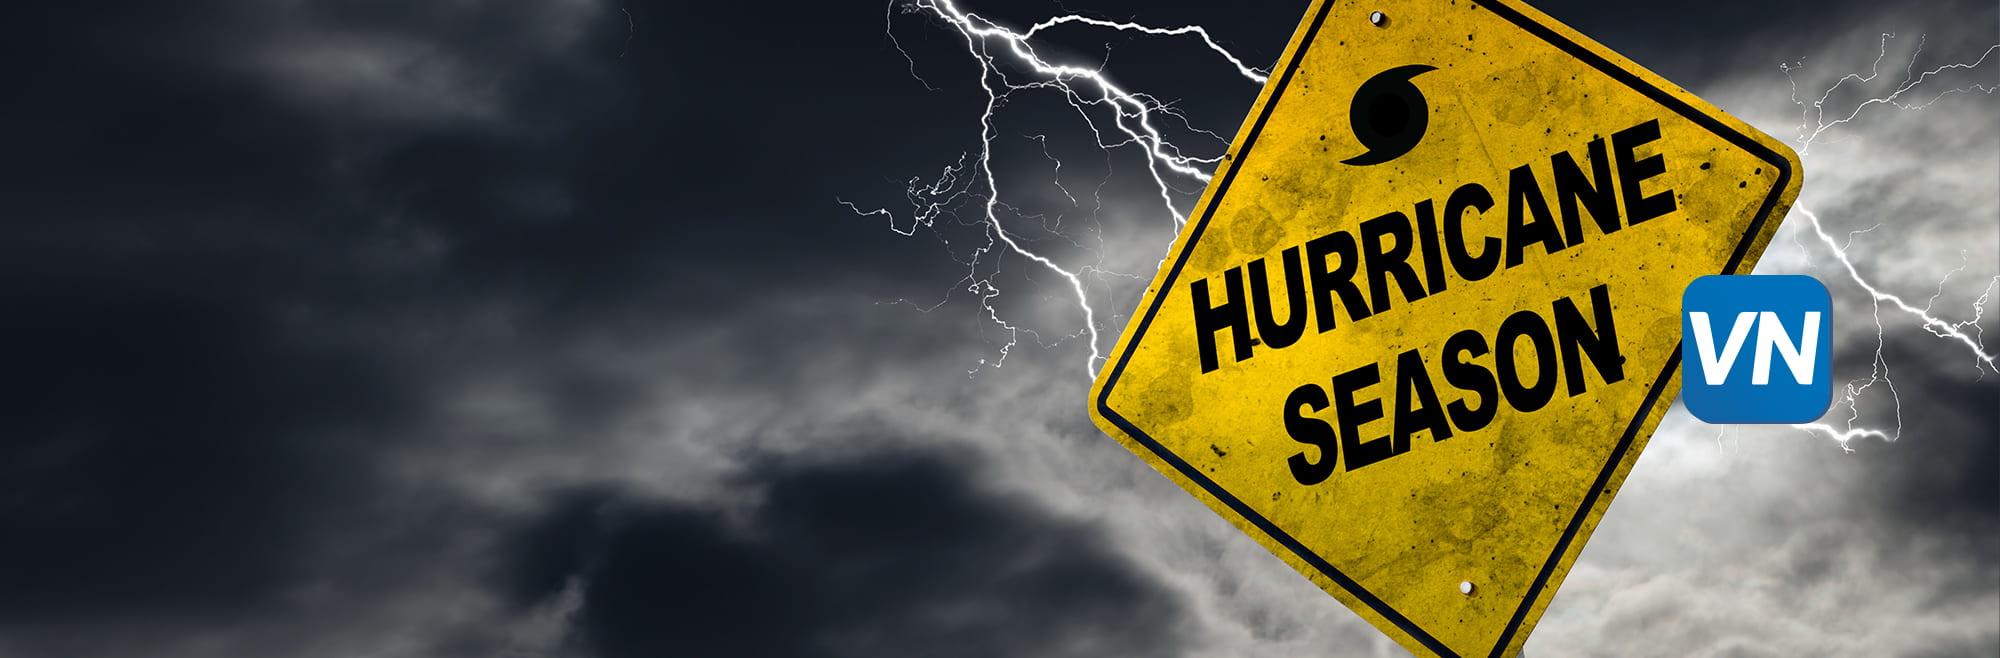 Hurricane Seasons is coming soon make sure your business is prepared!